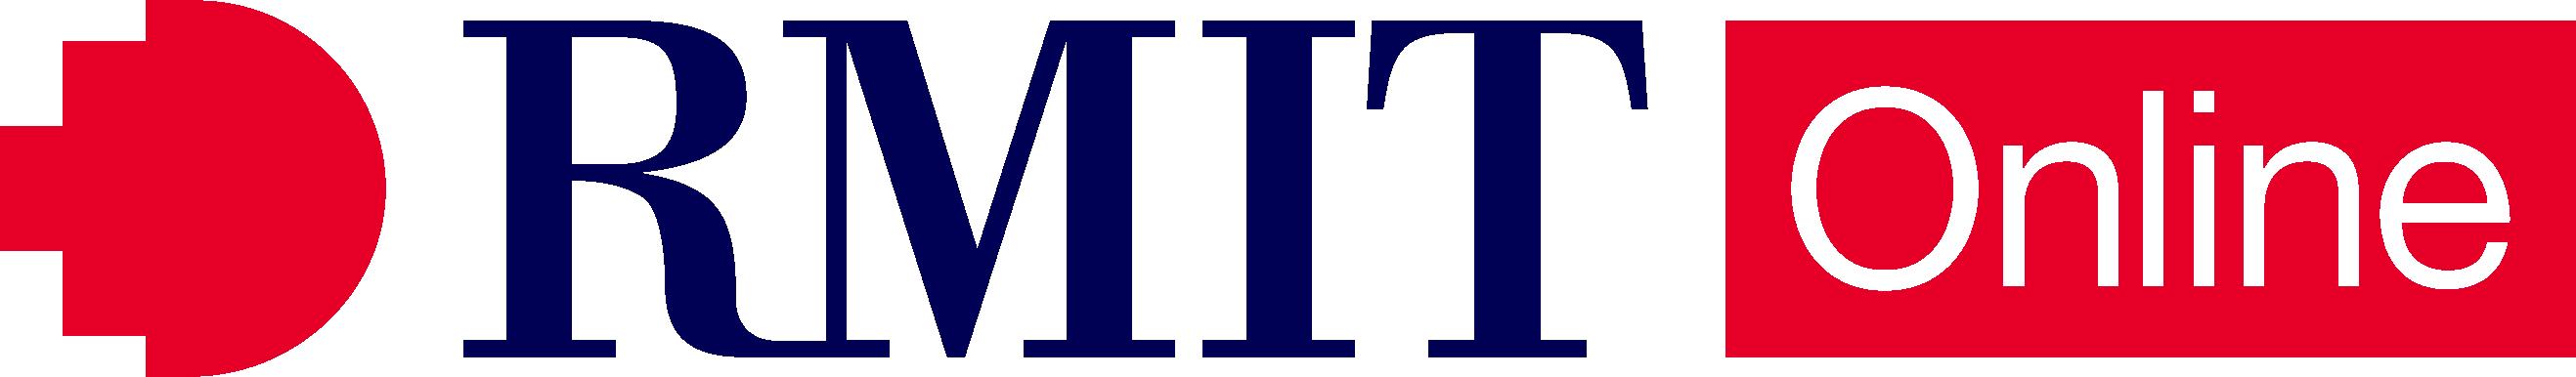 RMIT Online Primary Logo - Digital Colour RGB